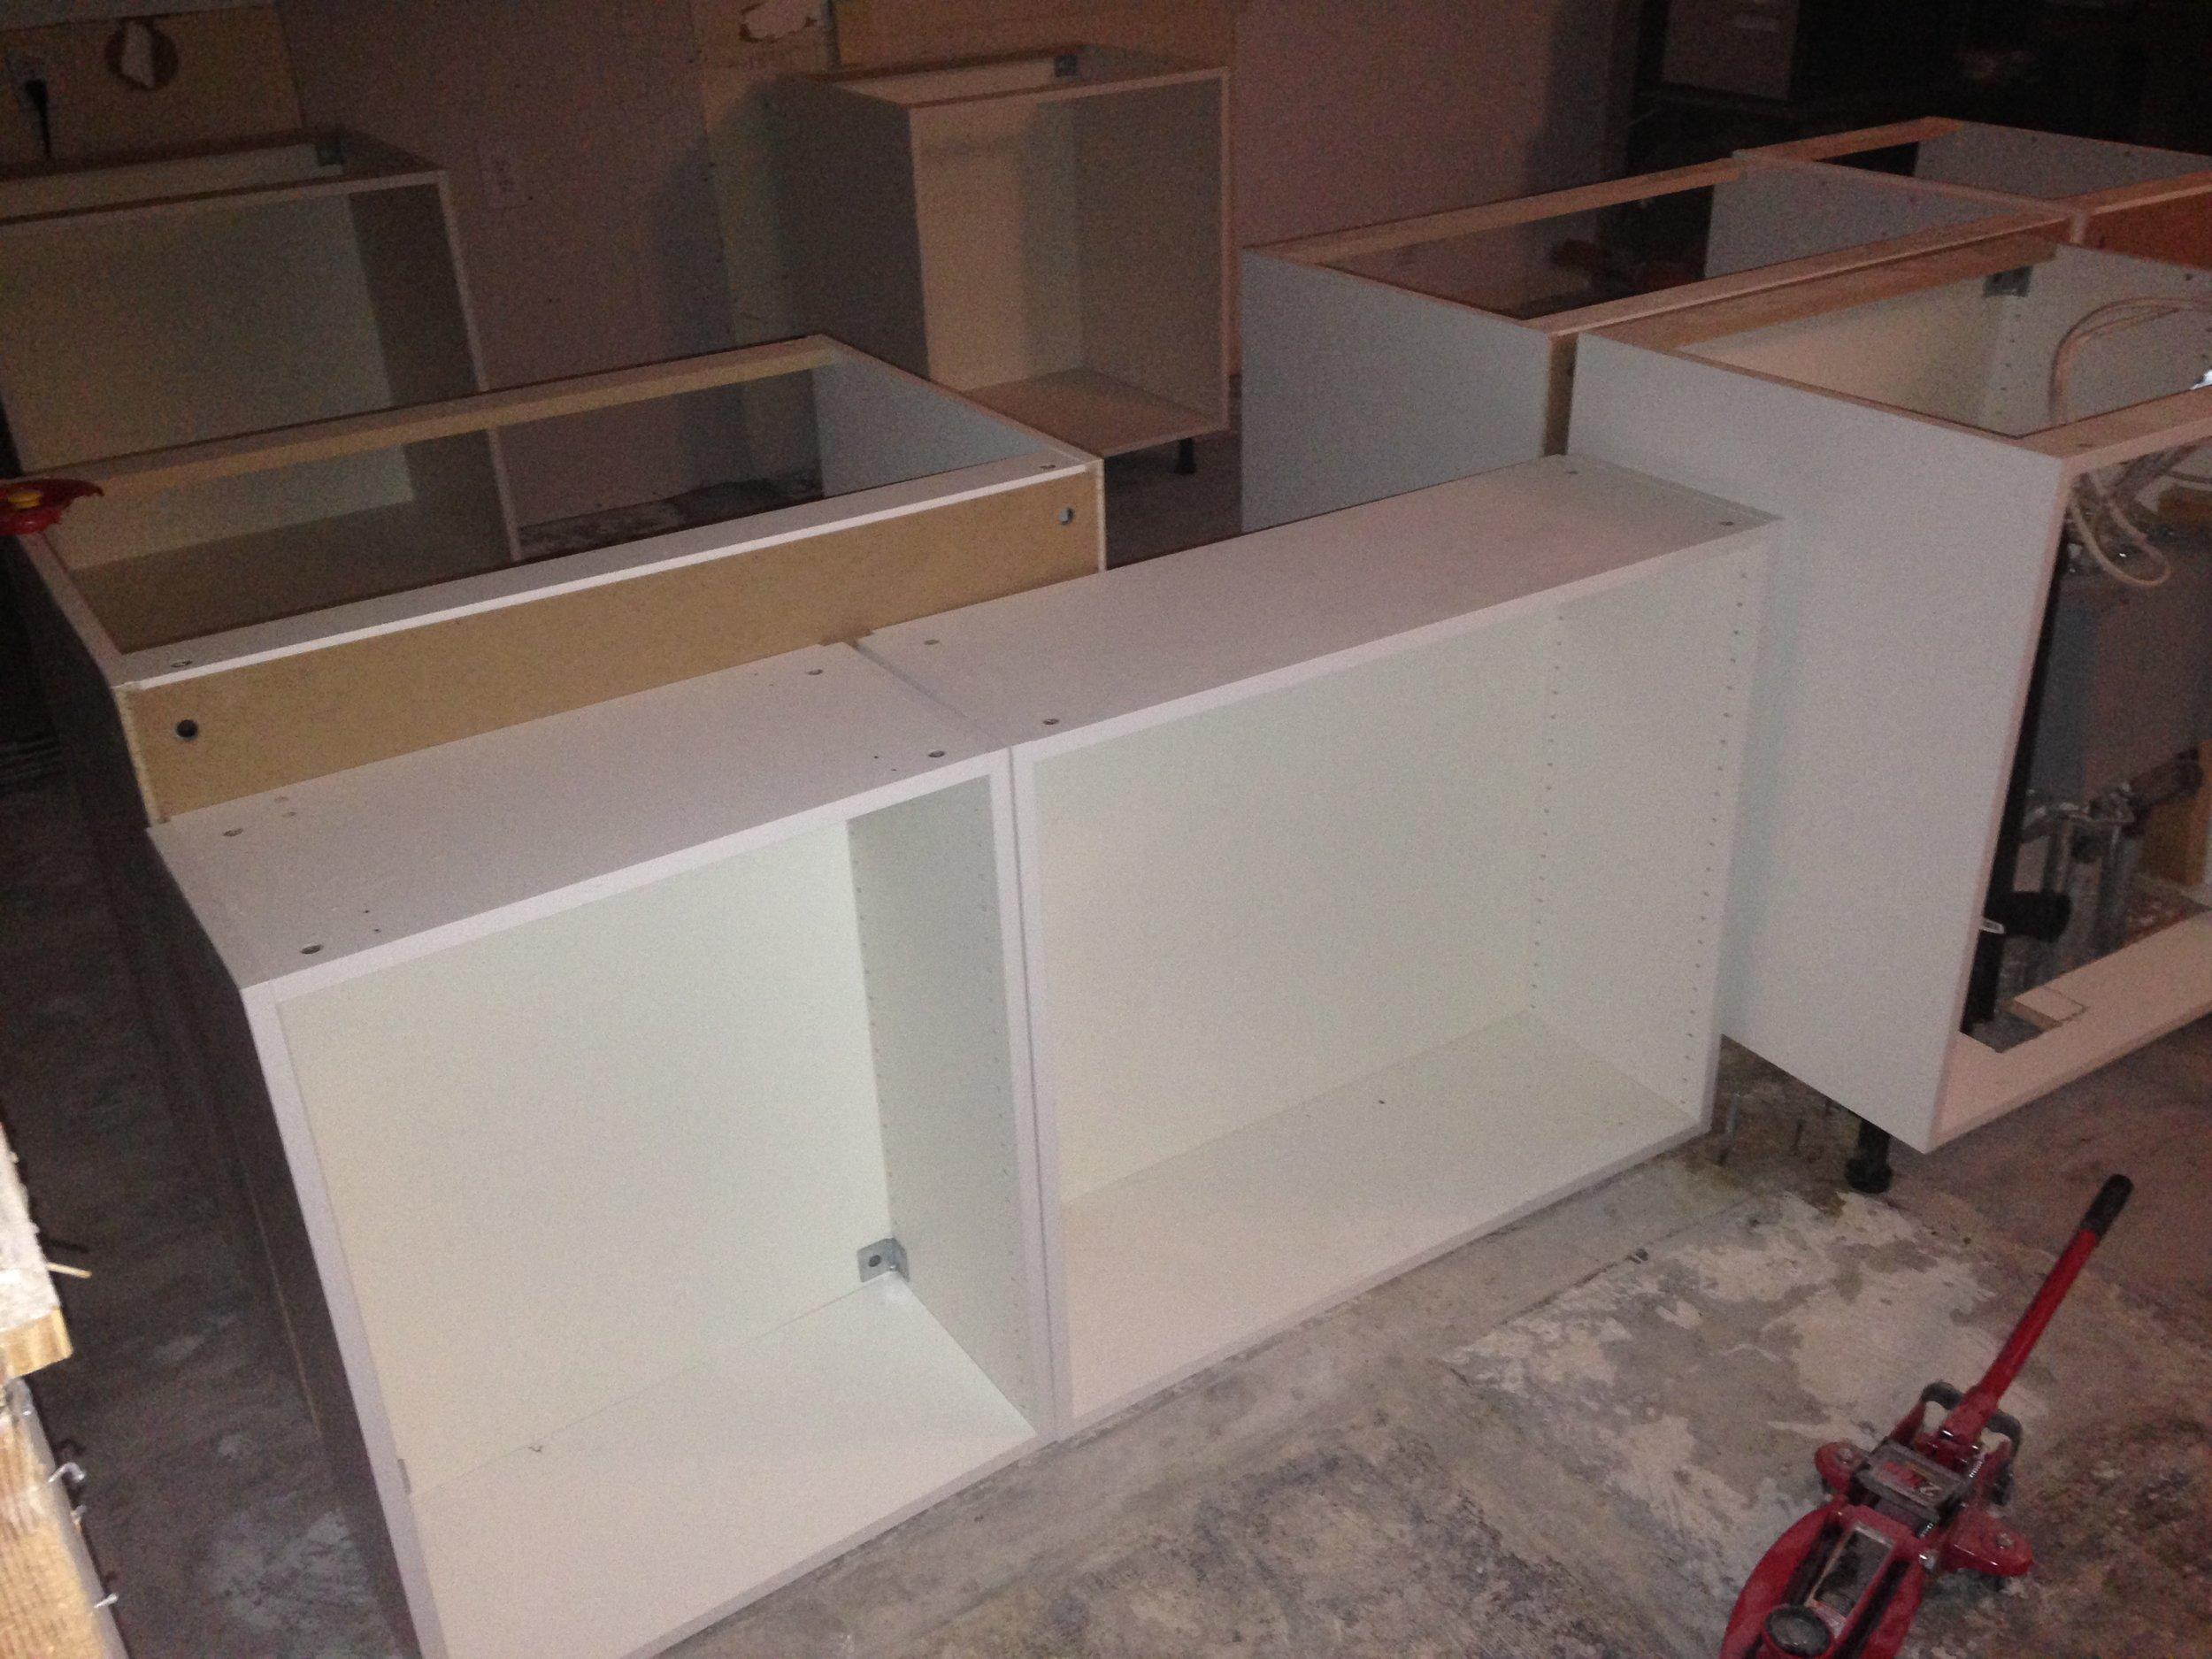 ikea-cabinets.jpg